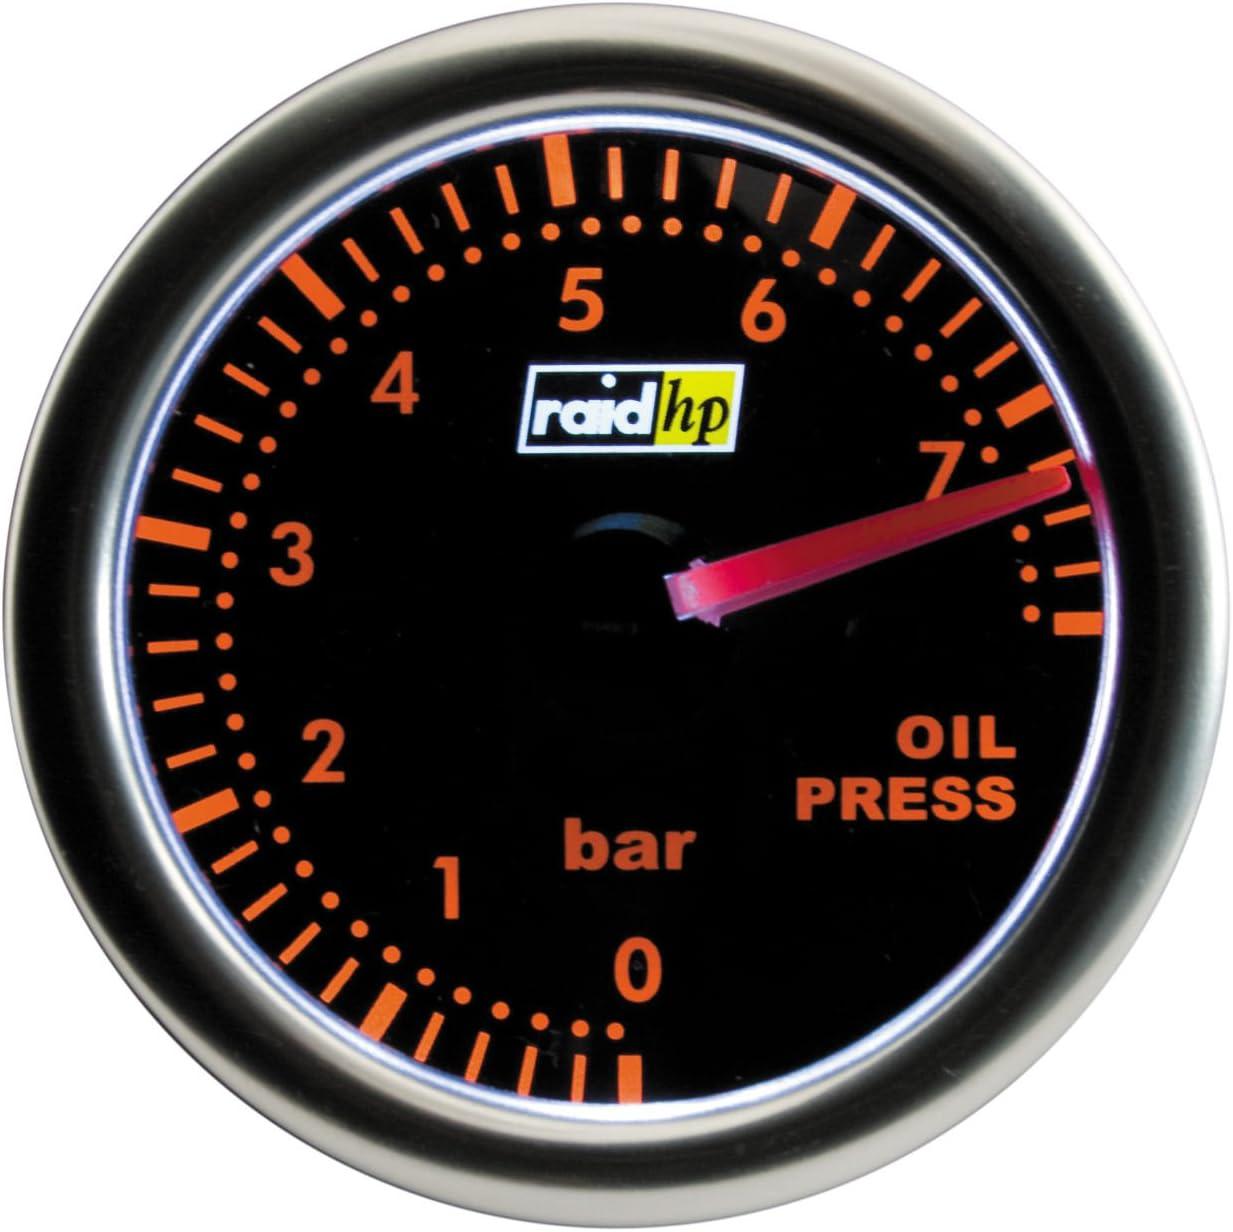 Raid Hp Night Flight 660252 Oil Pressure Gauge Add On Instrument Red Auto